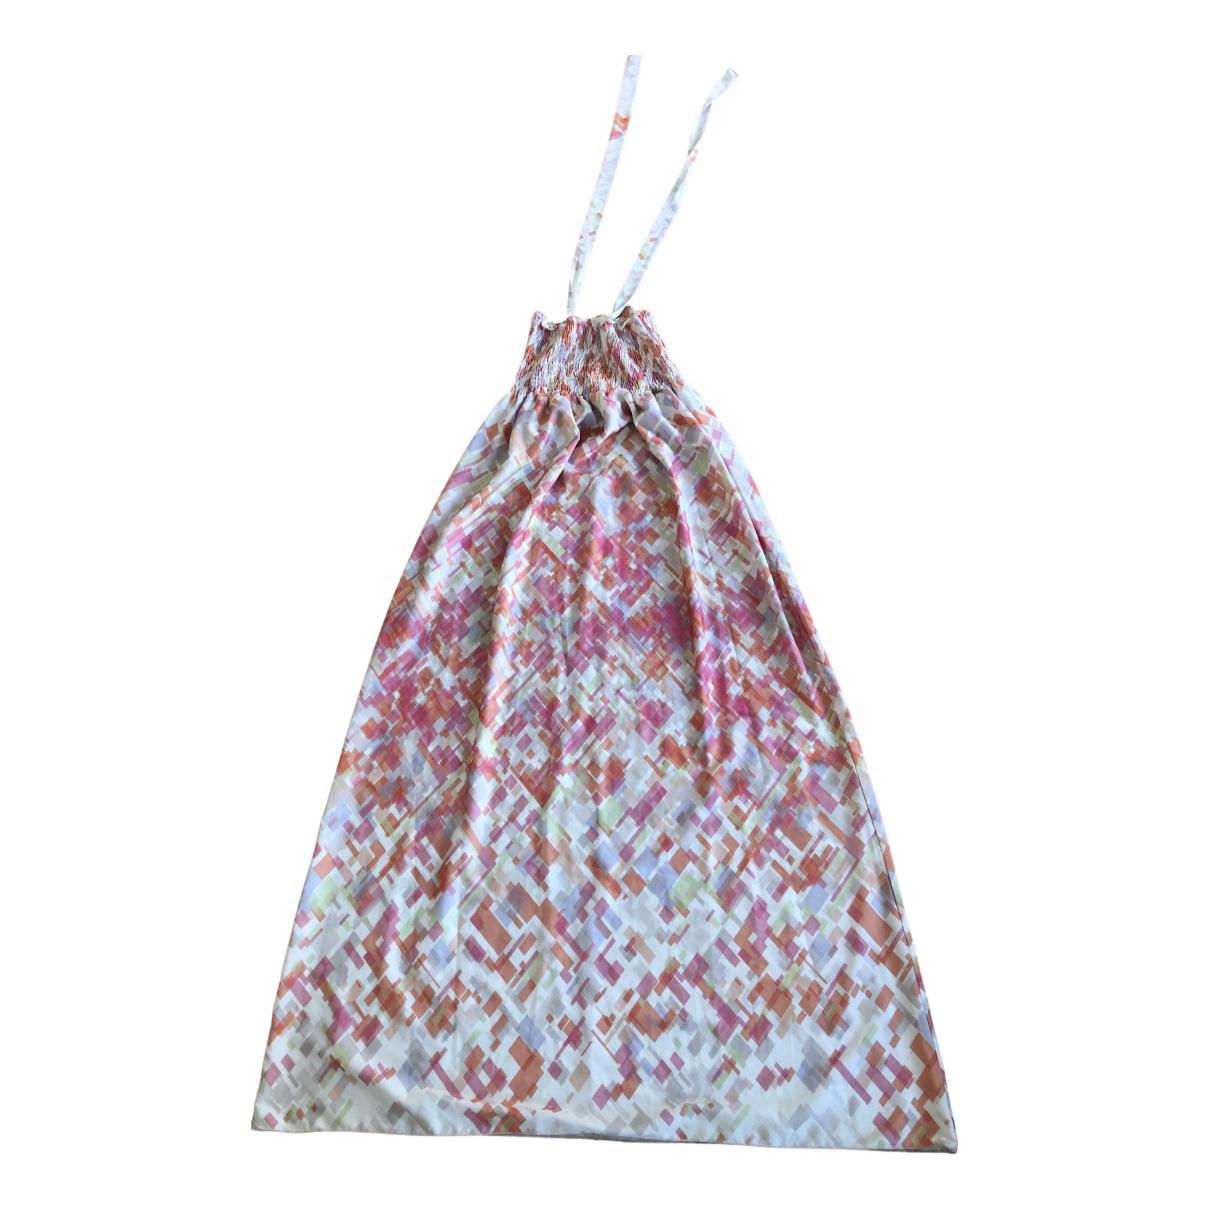 Gas \N Multicolour dress for Women 36 FR